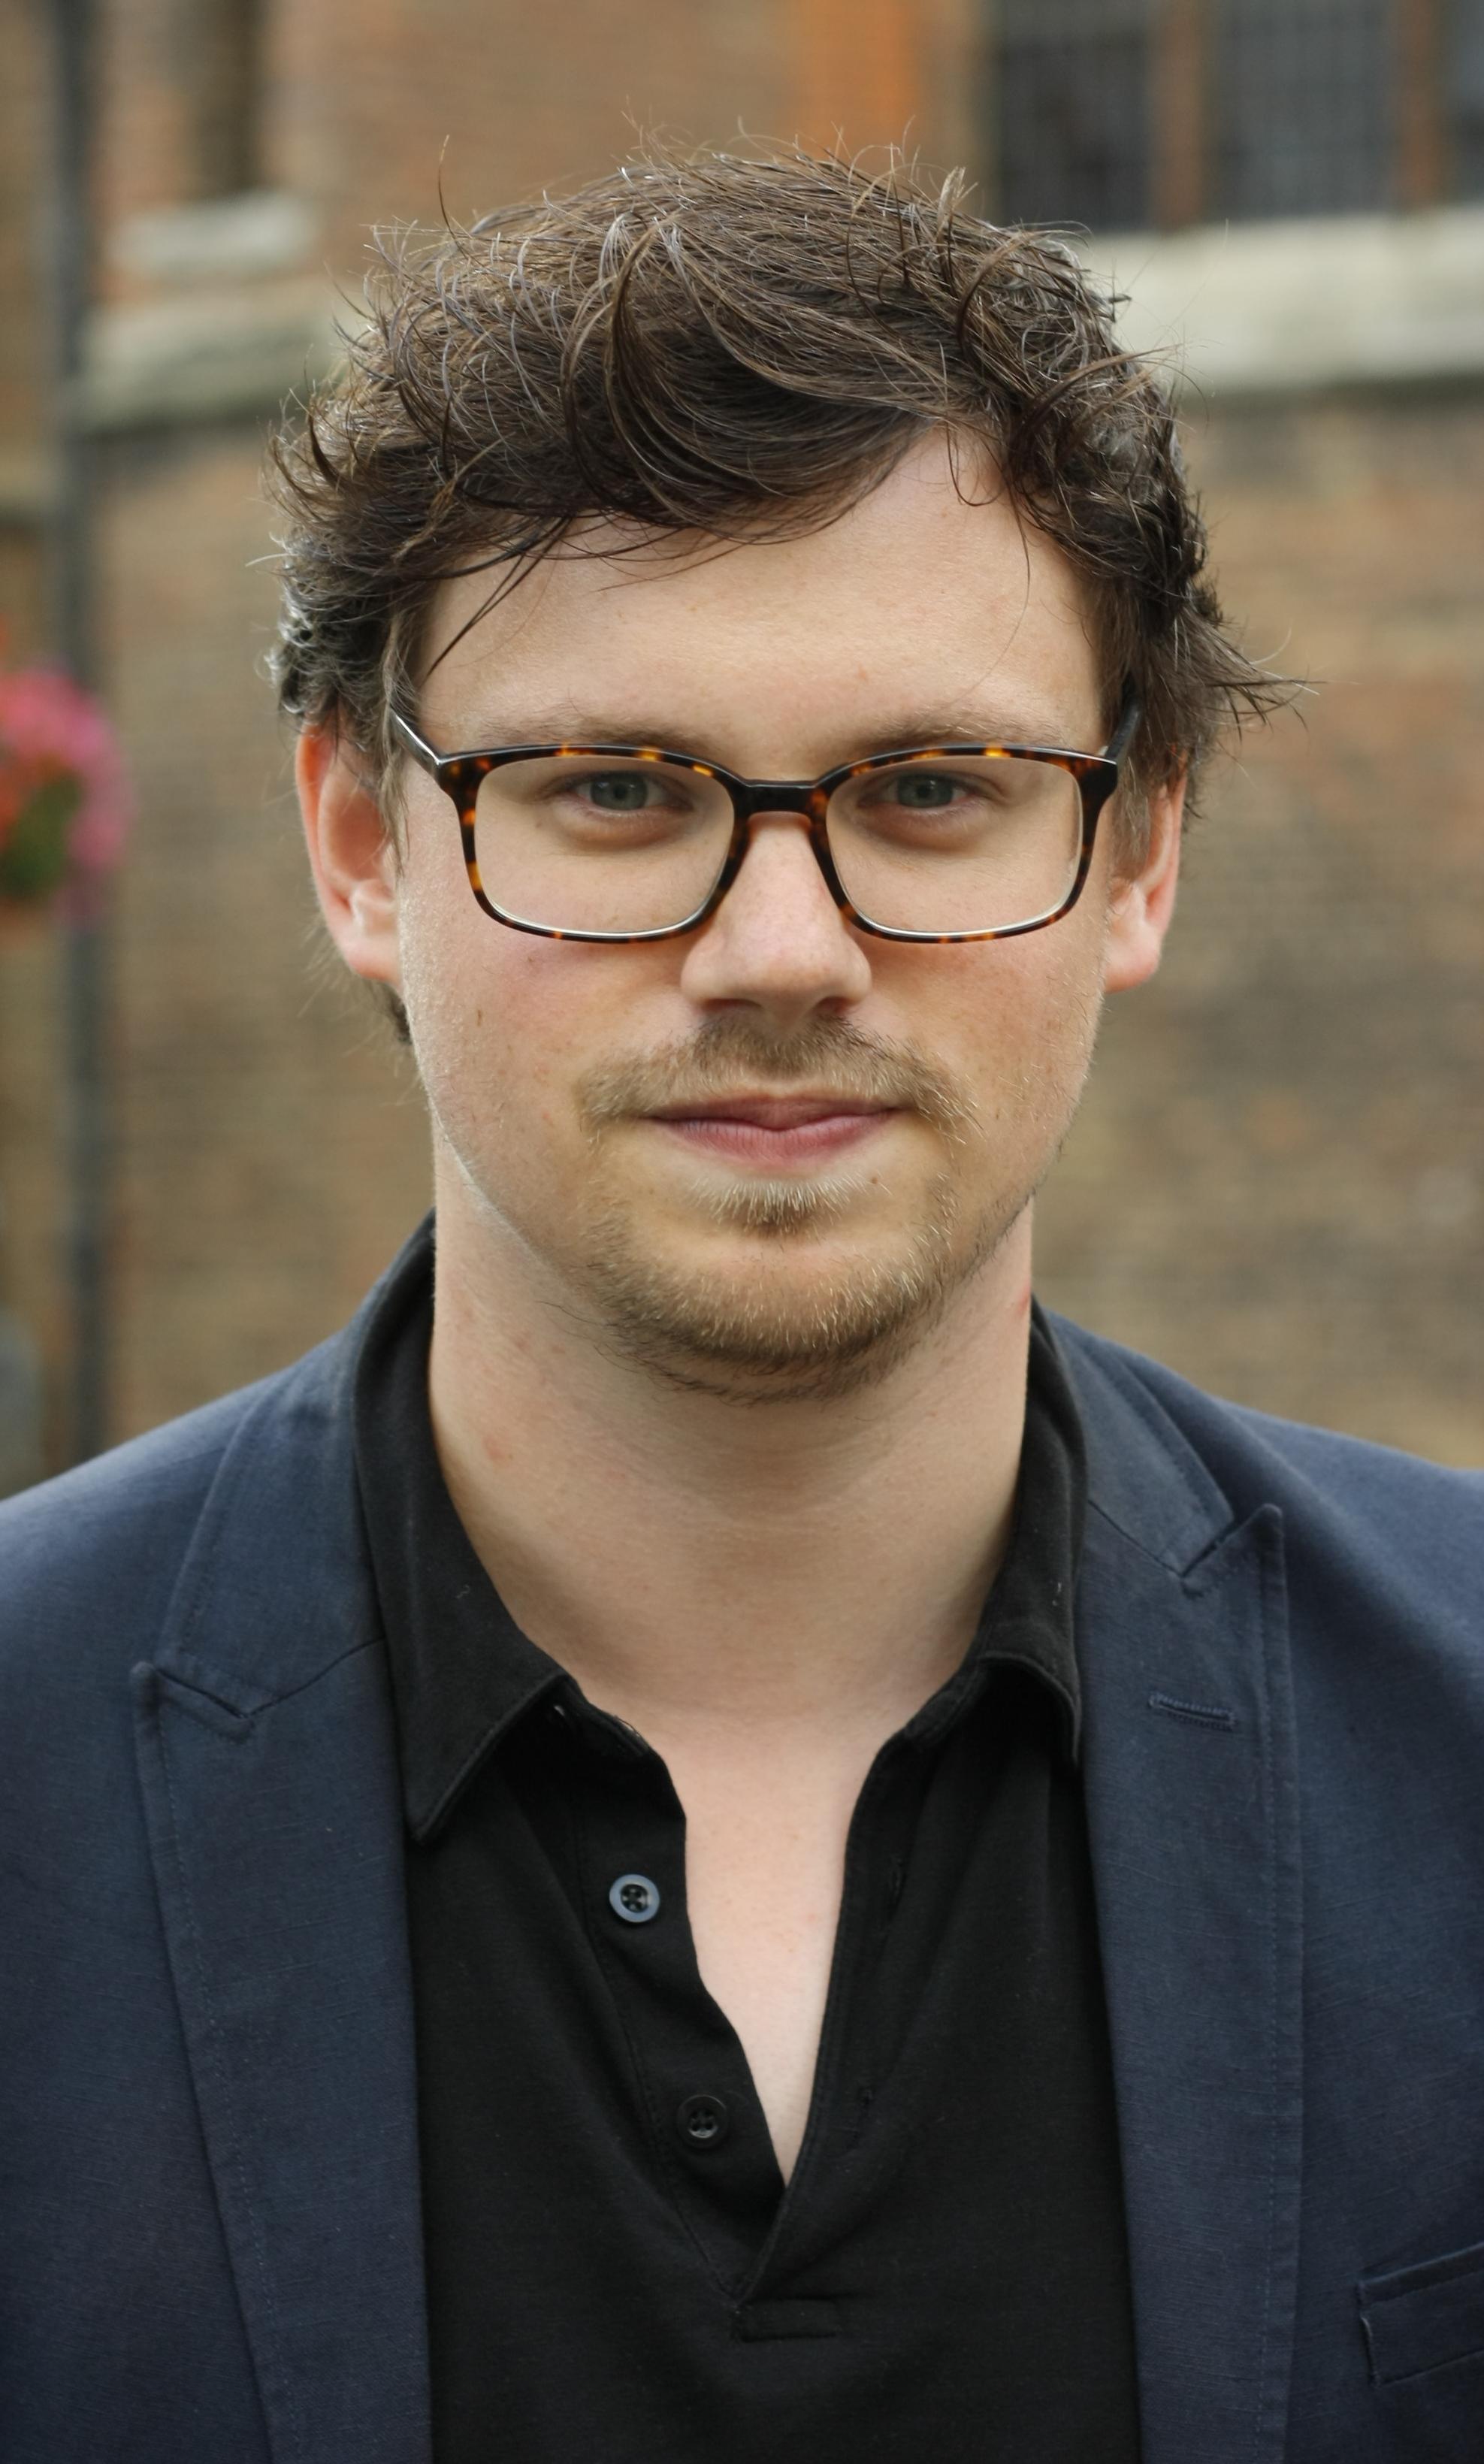 Mikel Johannes Hubertus Venhovens